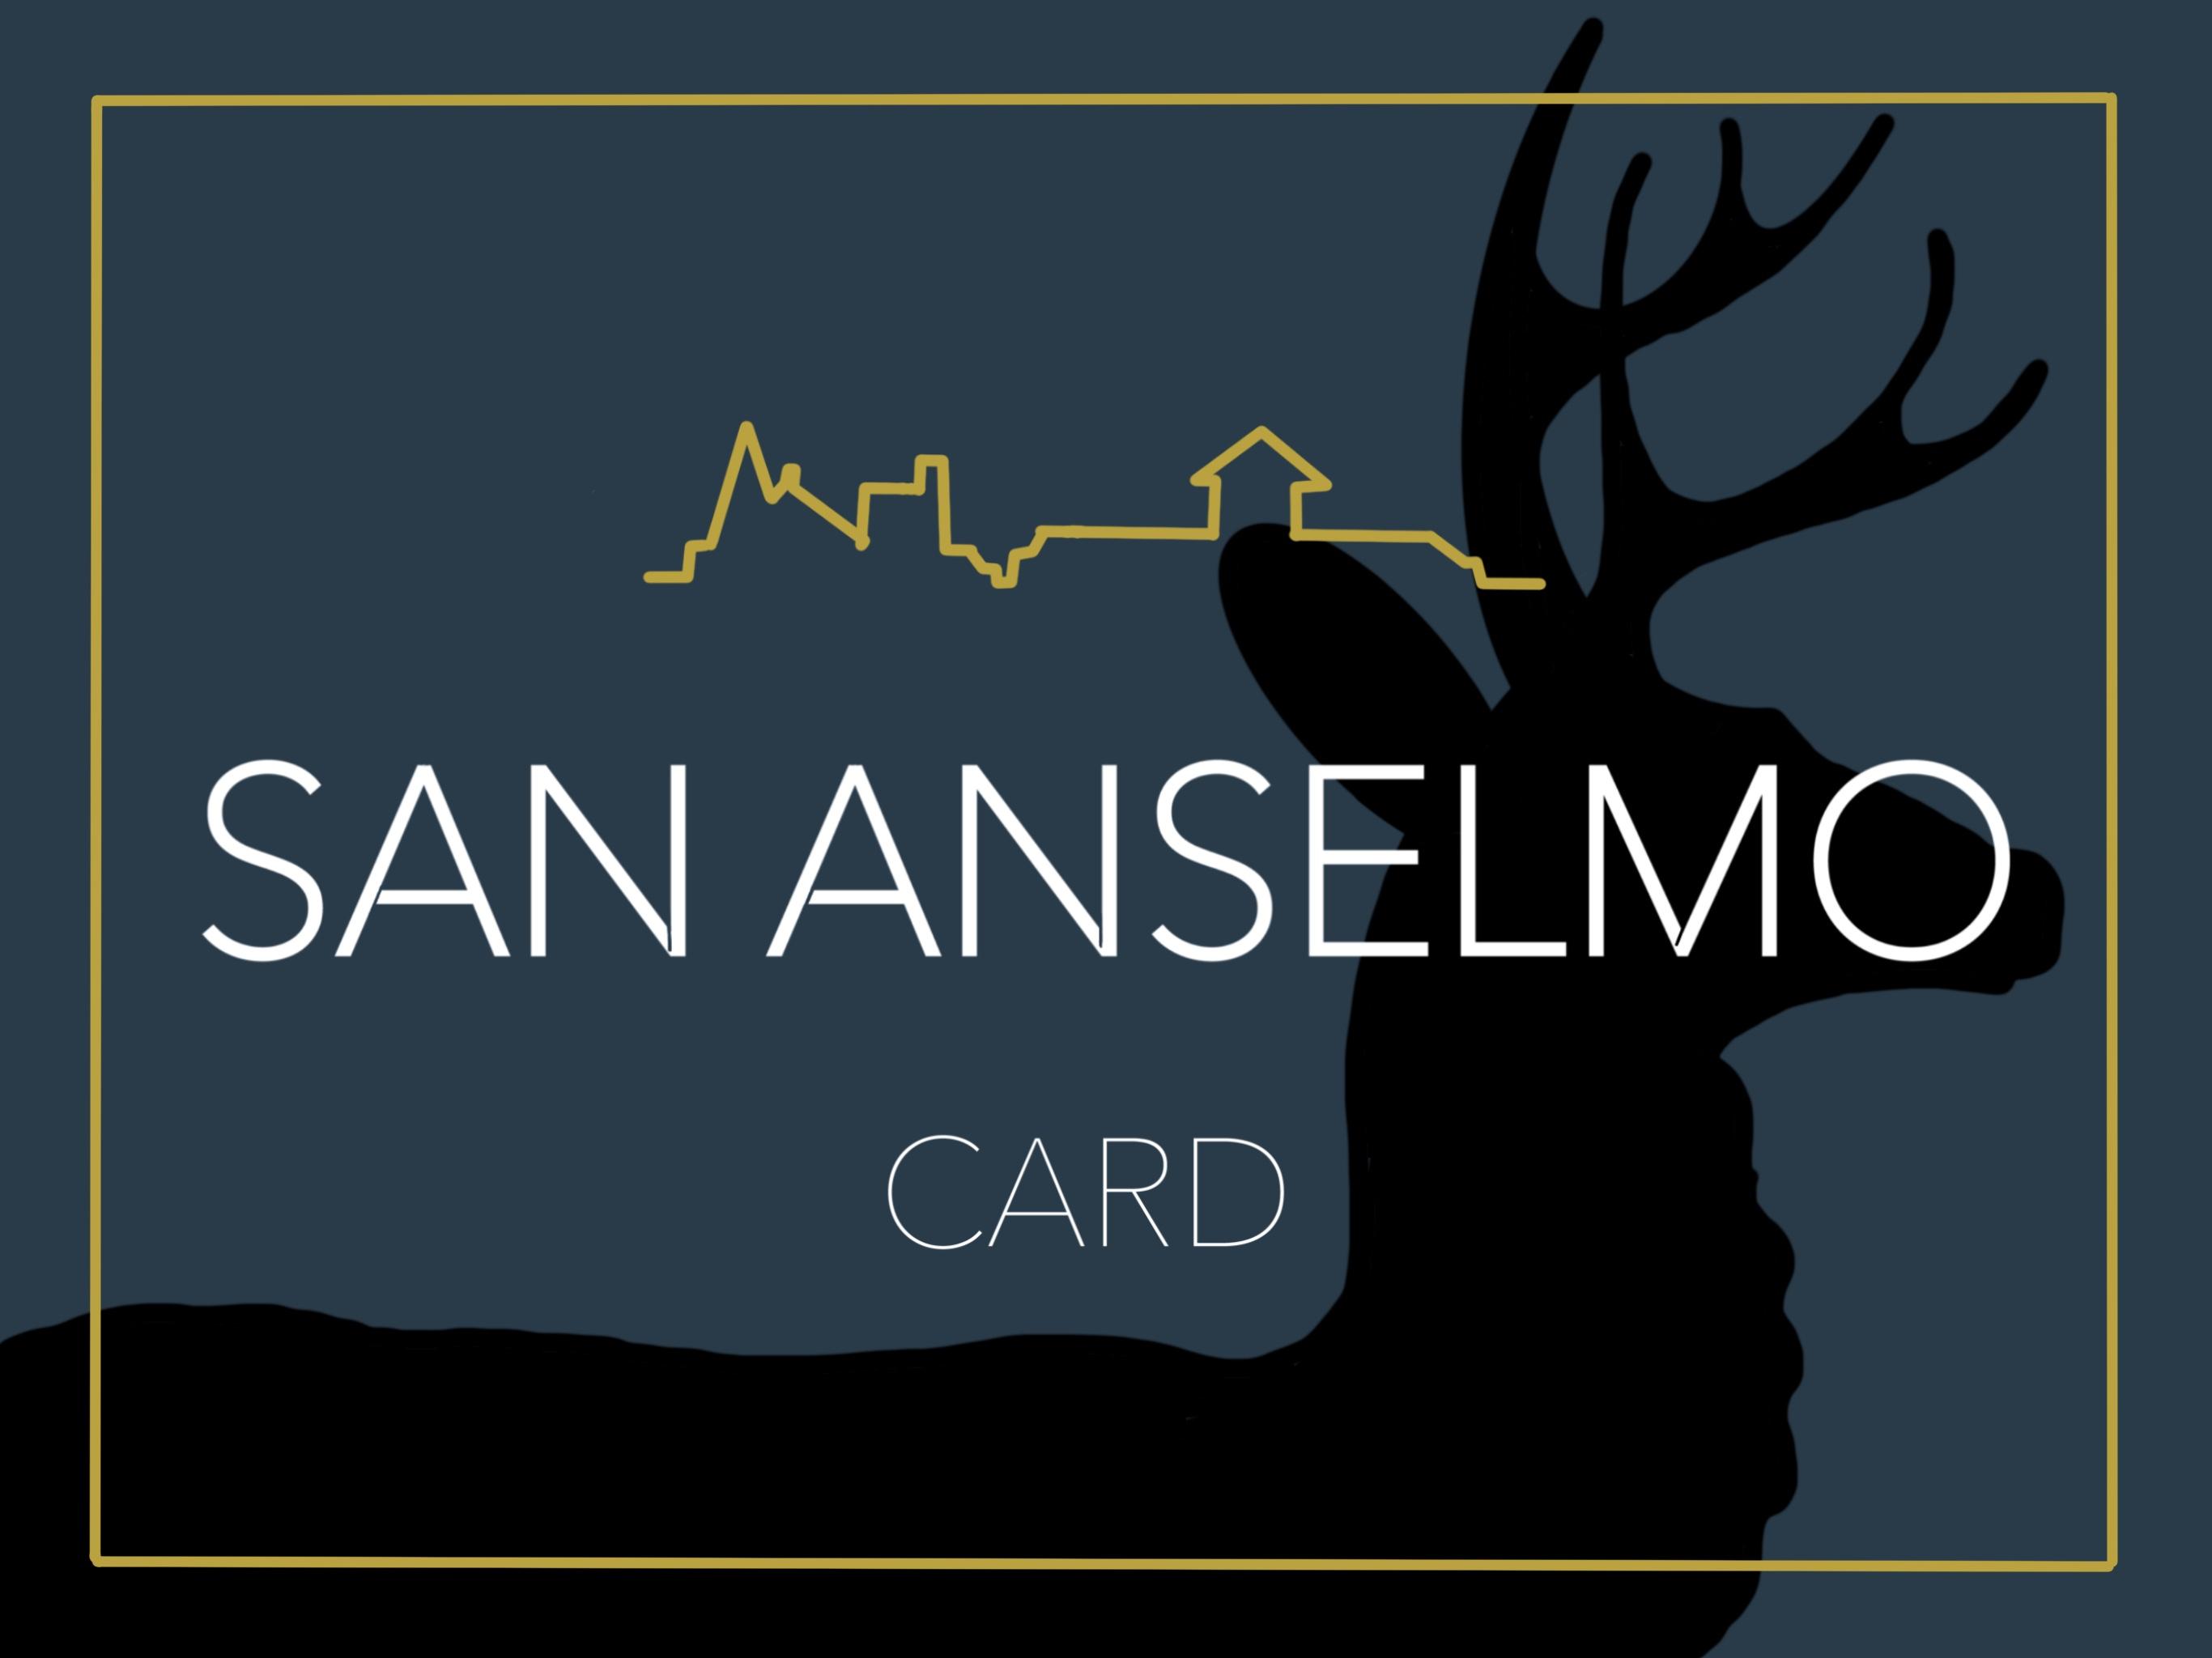 San Anselmo Card Digital Gift